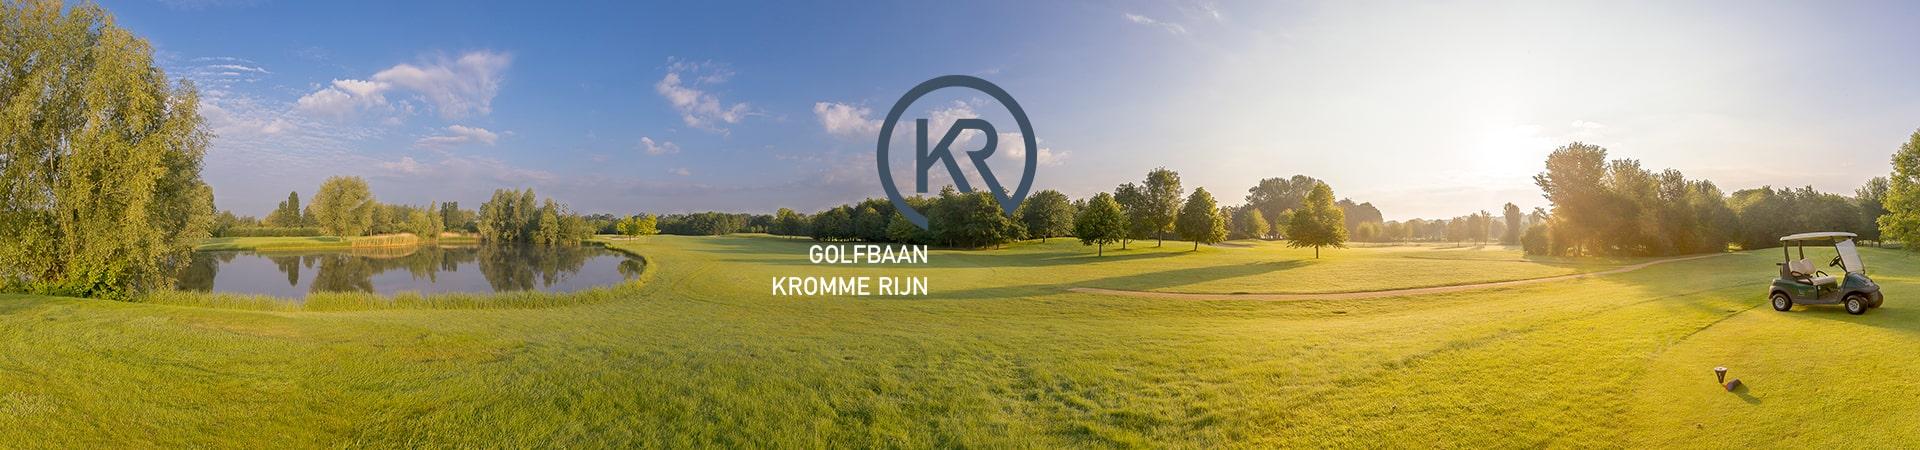 header golfbaan logo 03